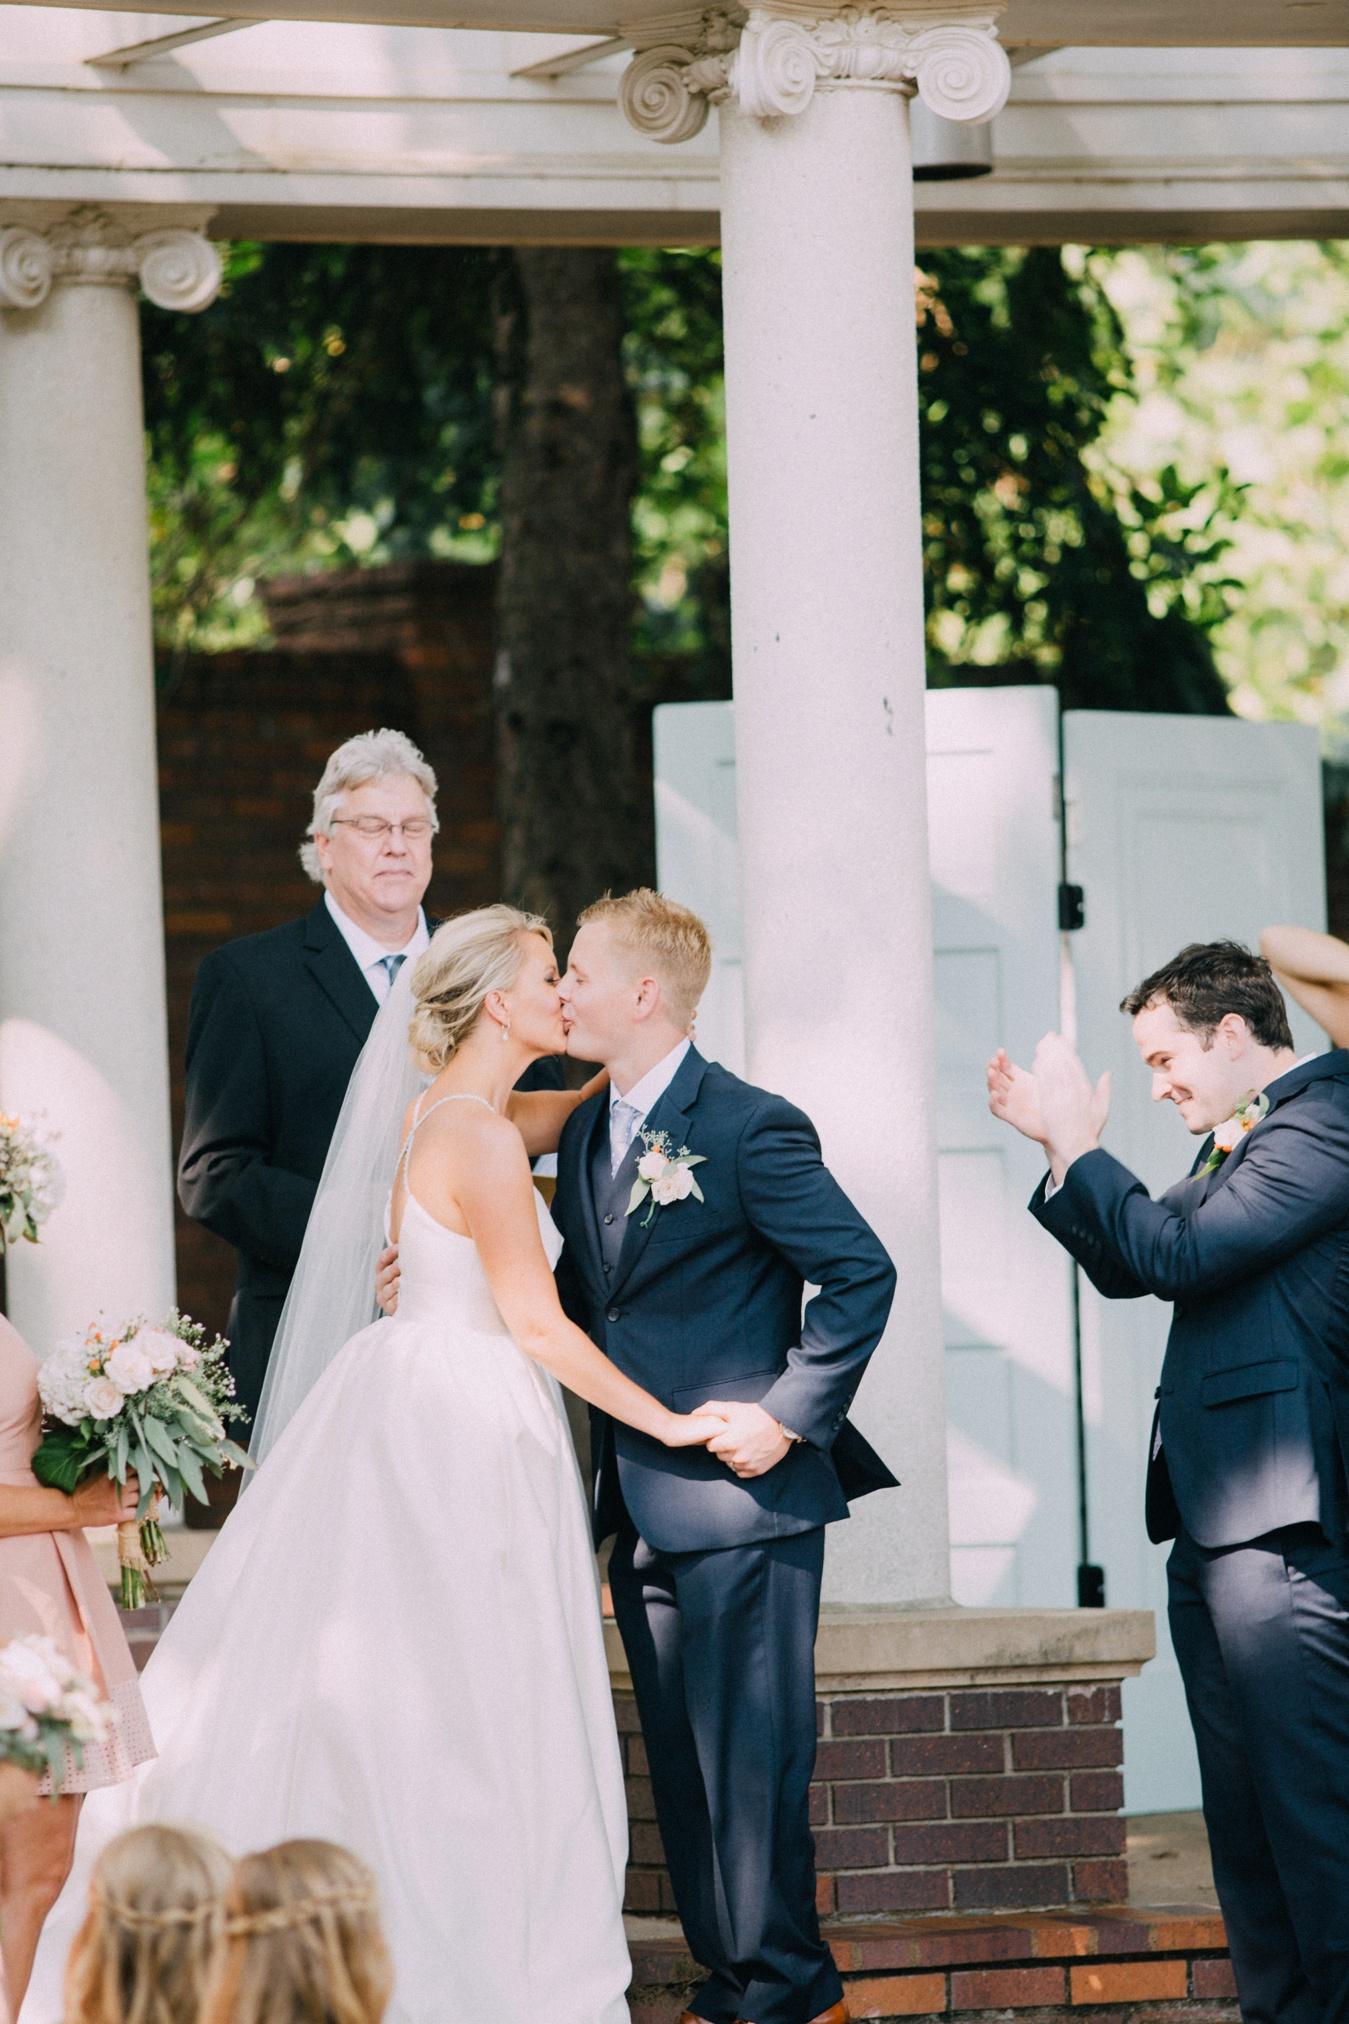 brenna+michael_wedding-437.jpg